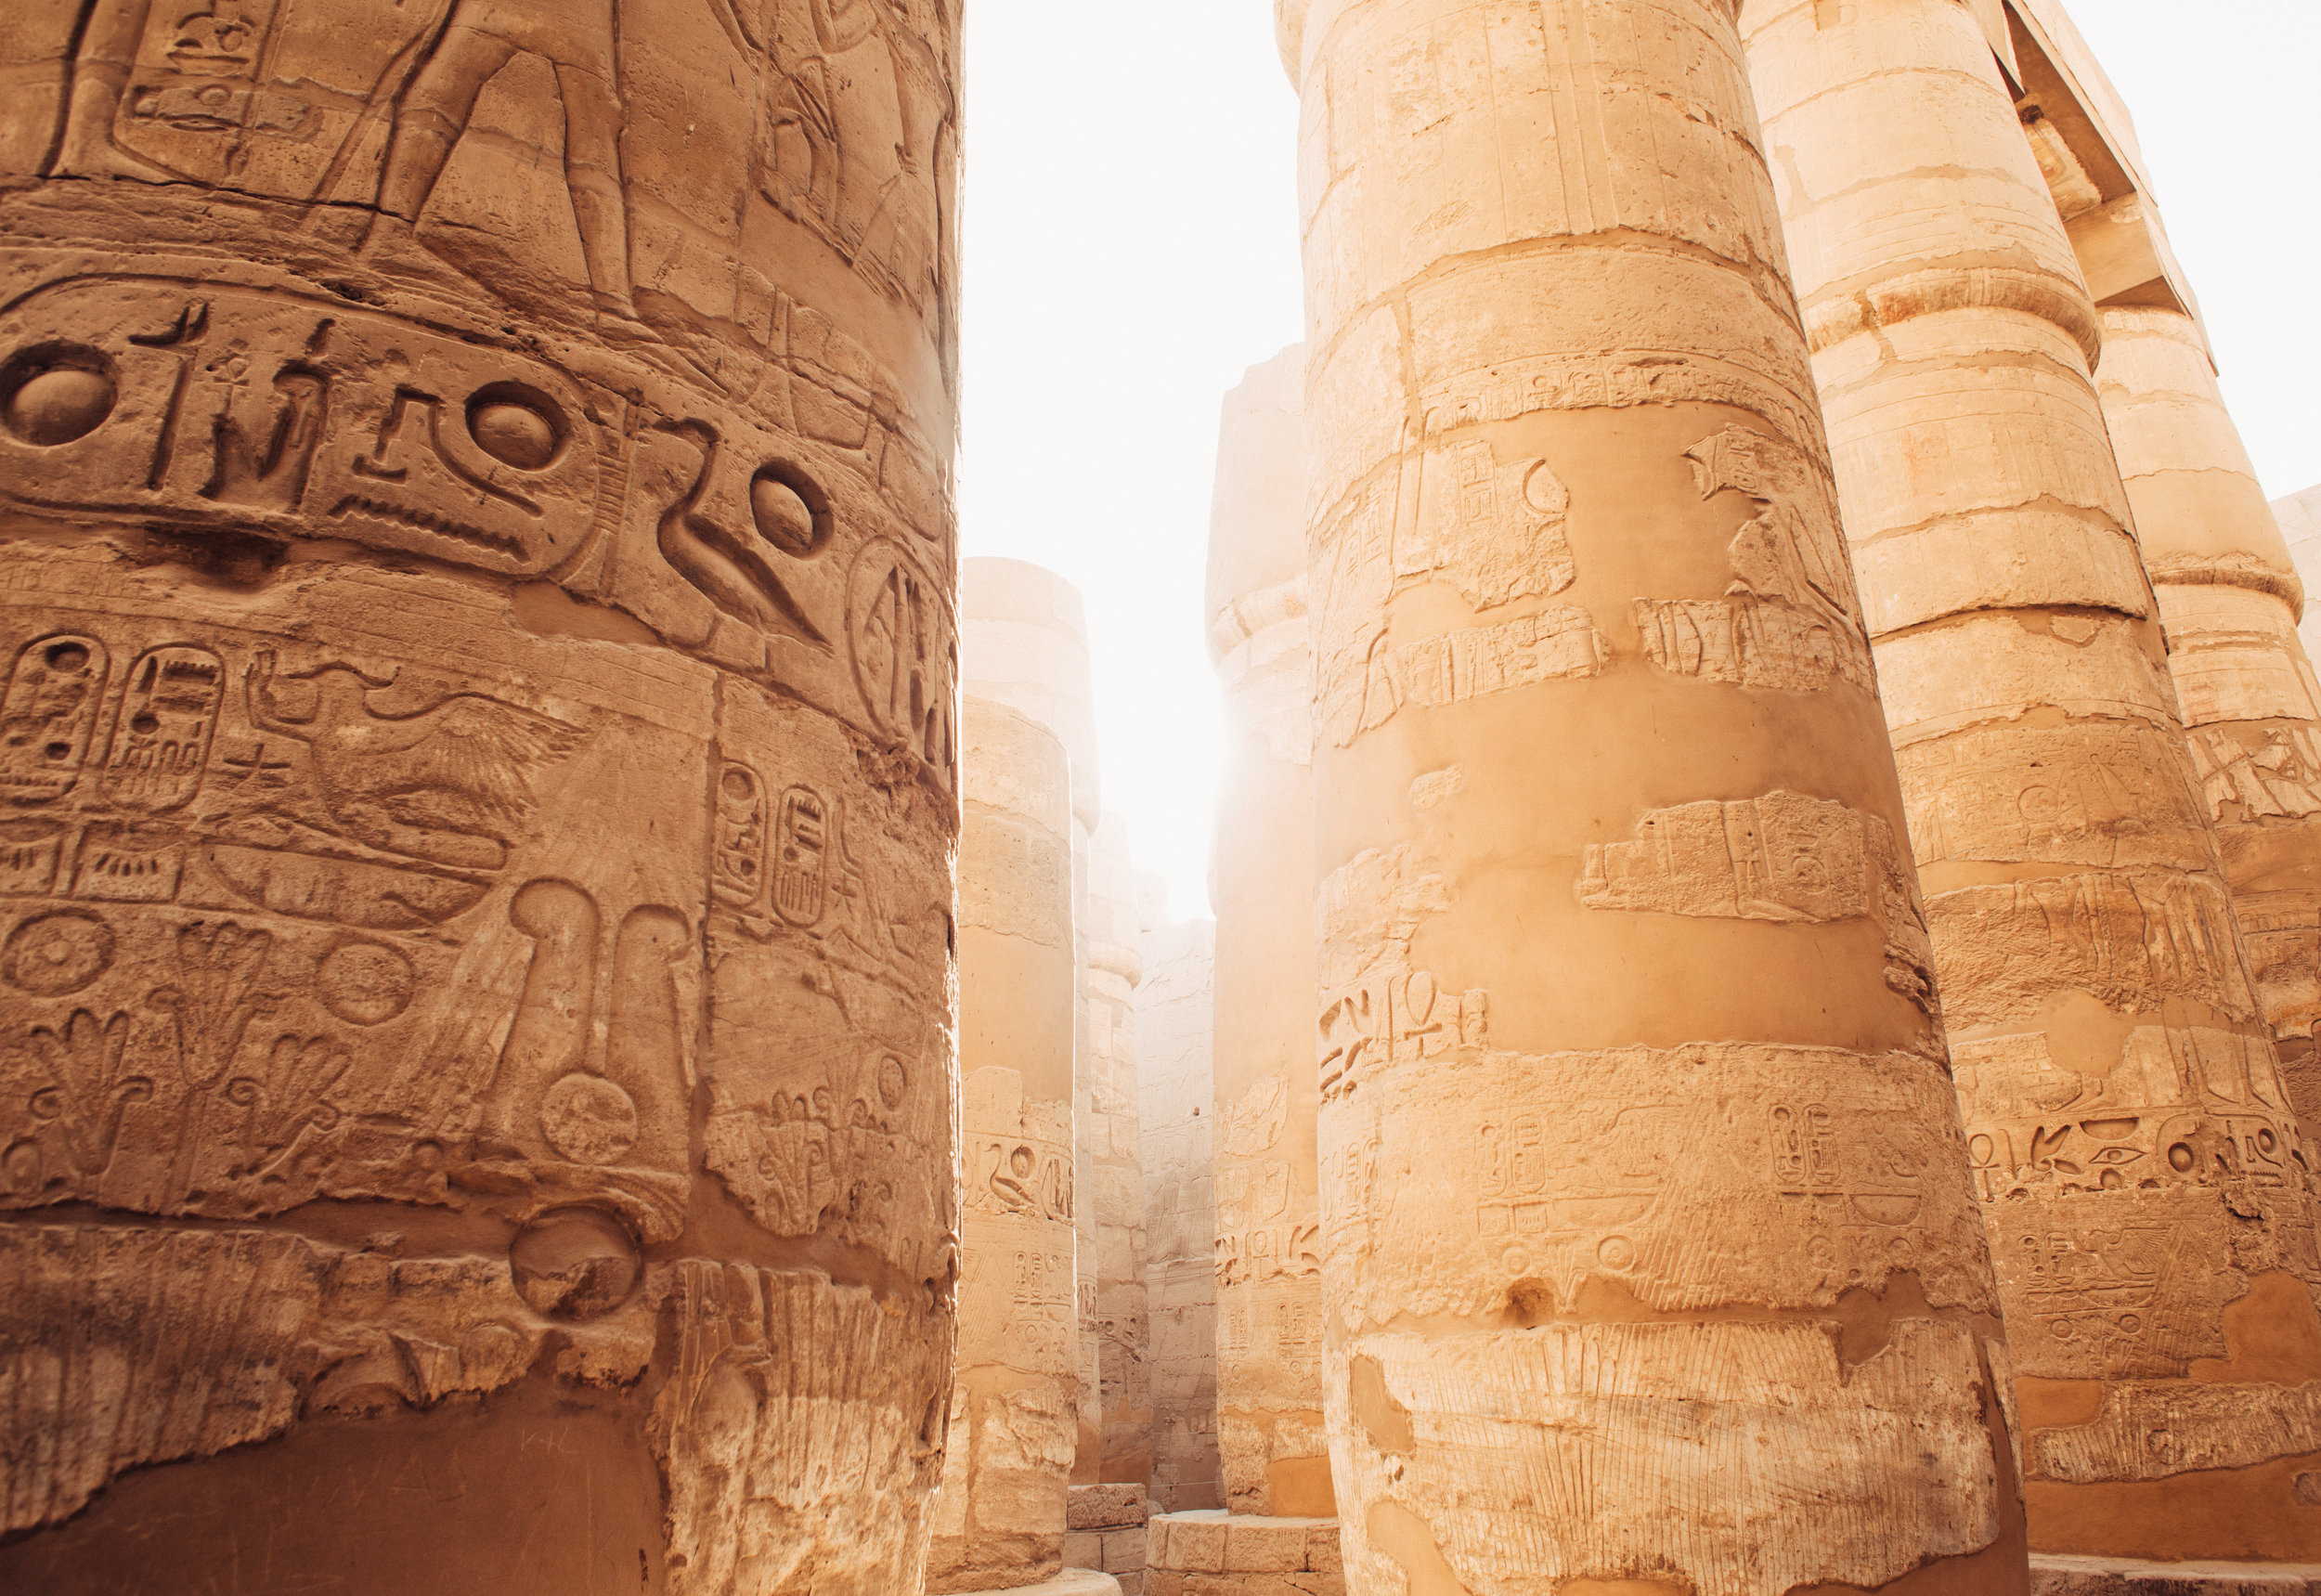 Karnak Temple_1.jpg